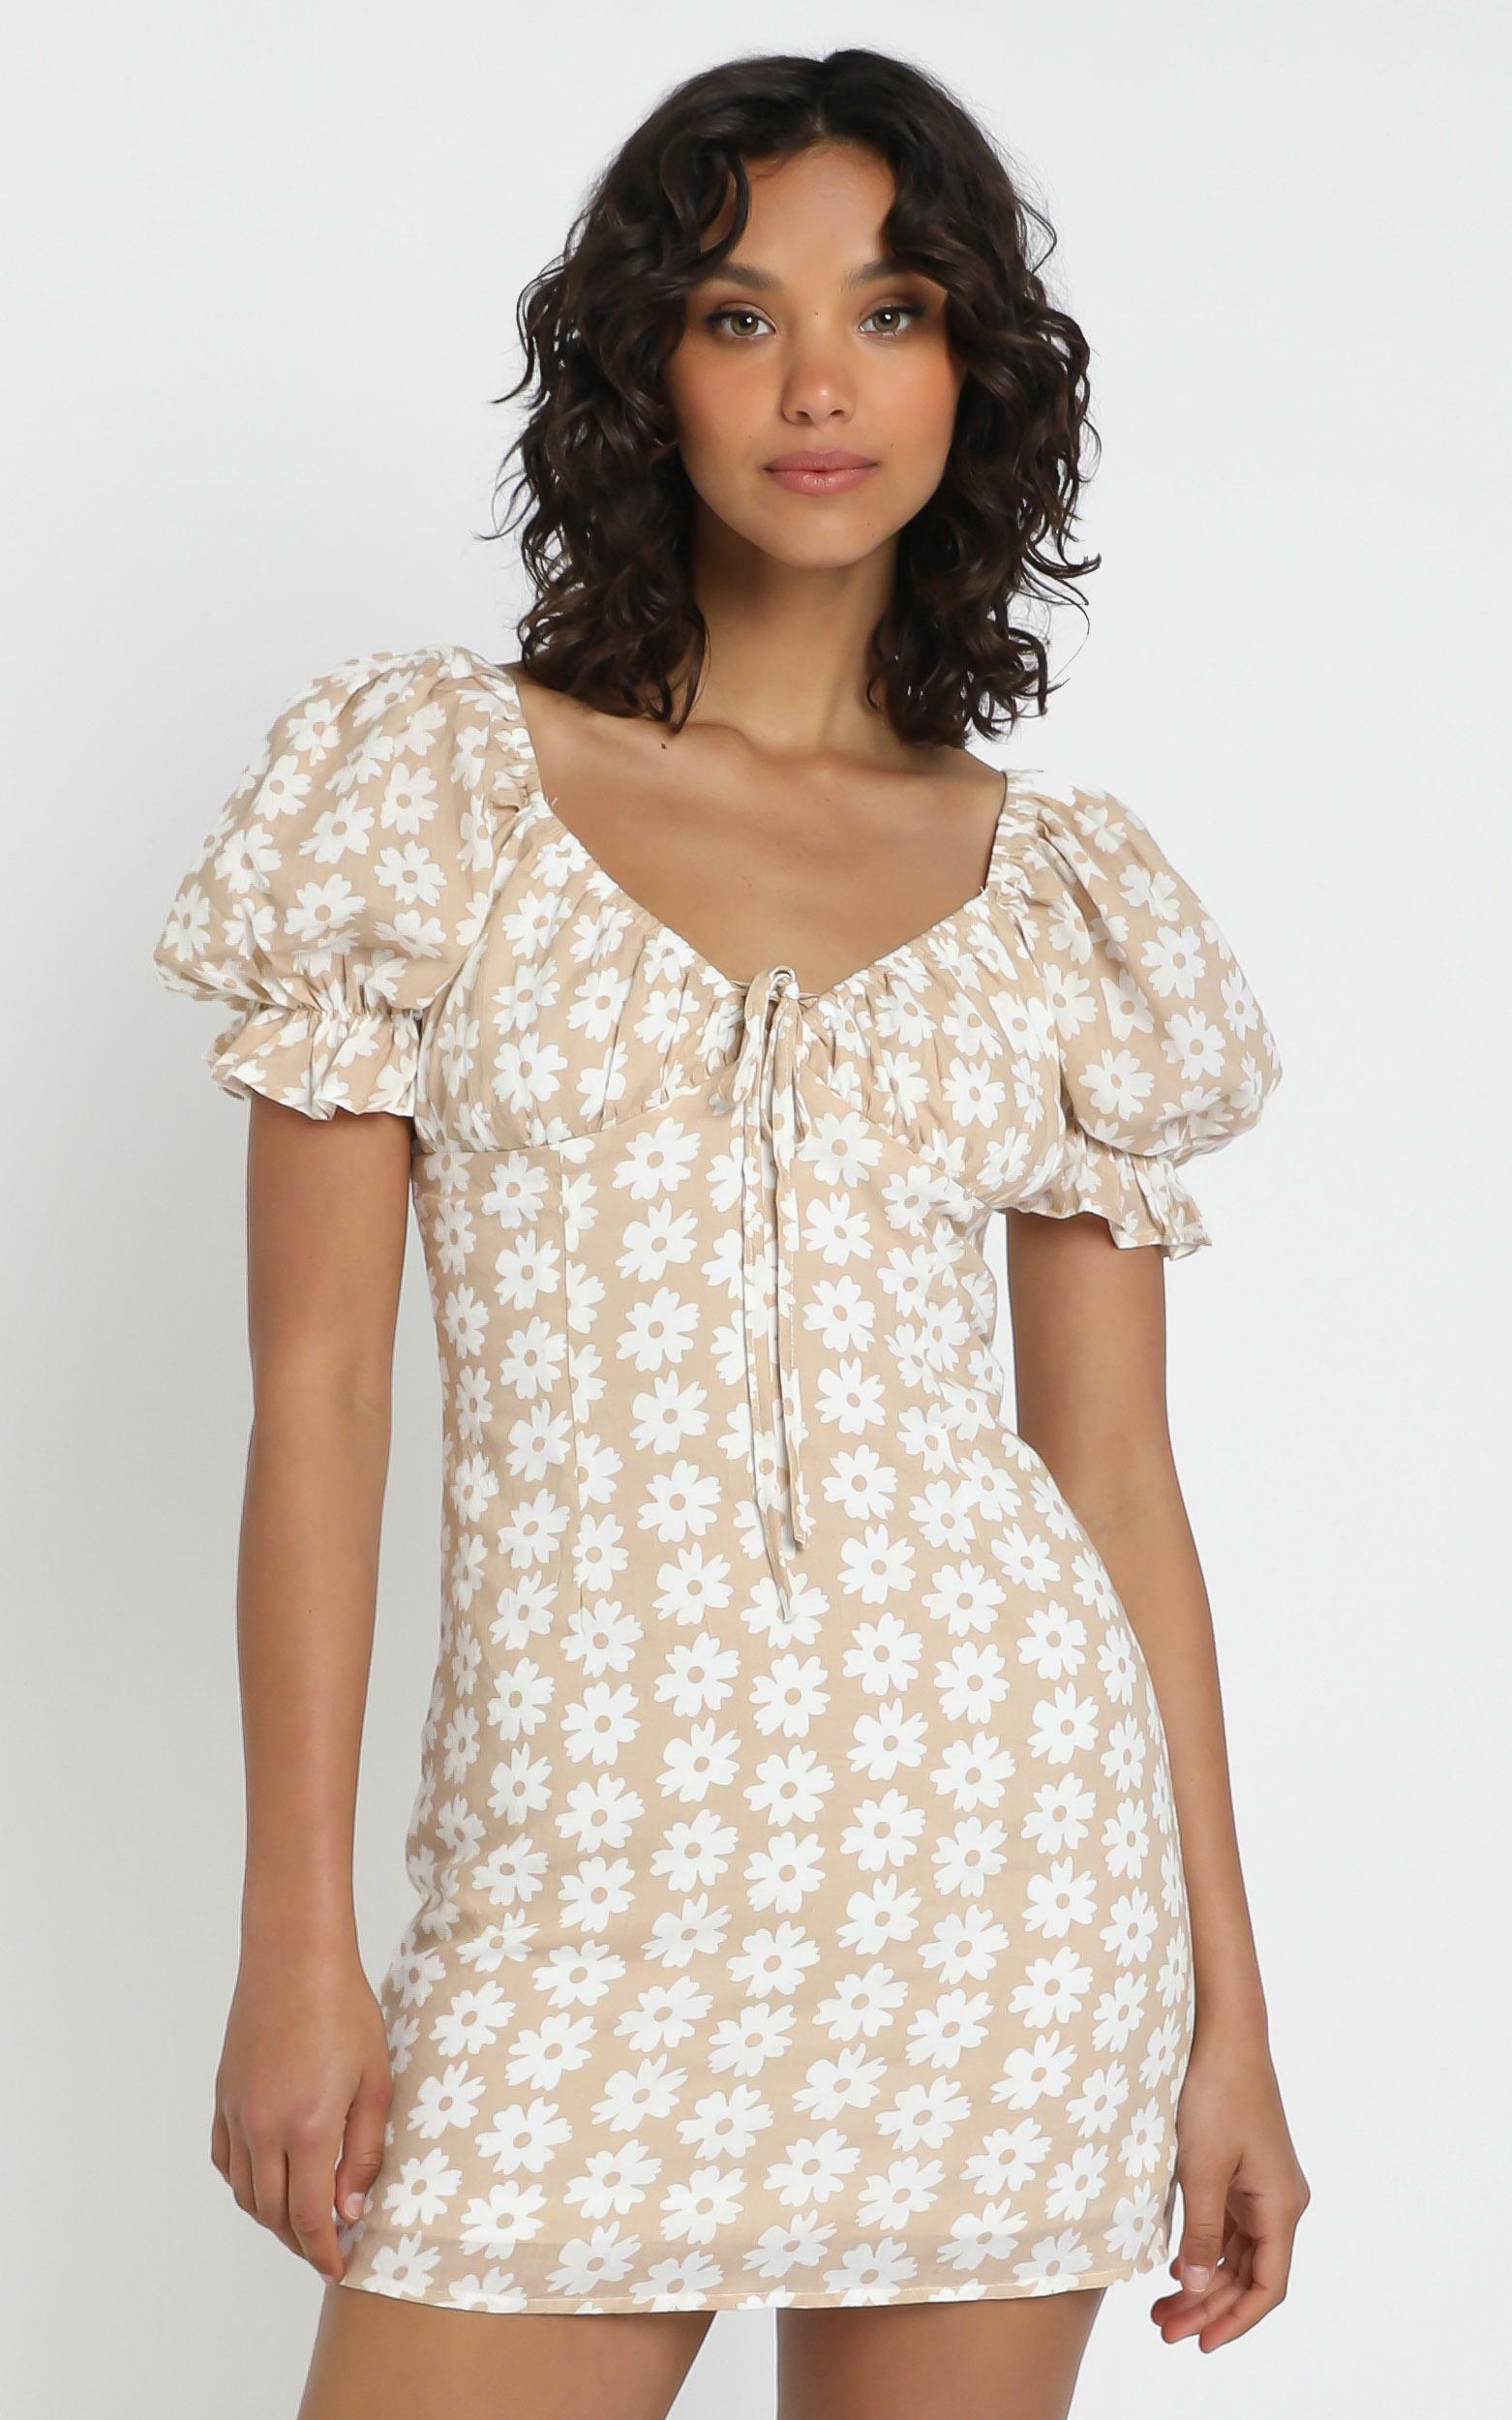 Hear The Choir dress in beige floral - 12 (L), Beige, hi-res image number null